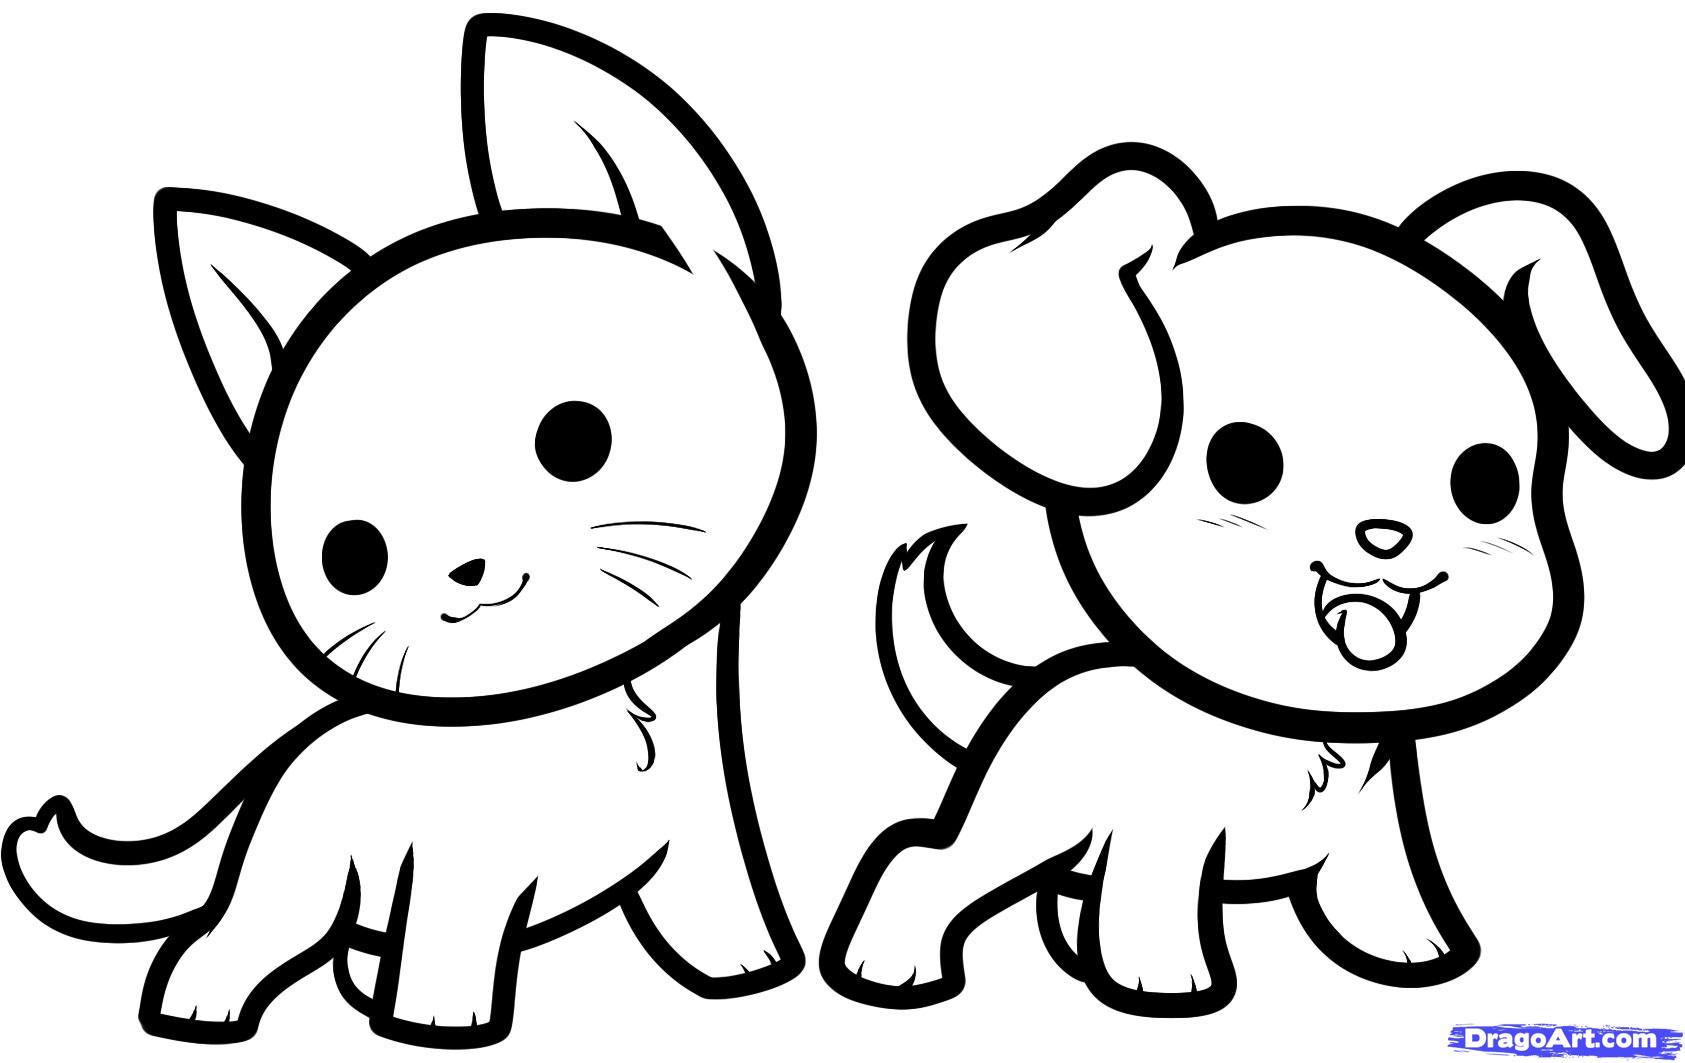 1685x1063 How To Draw Kawaii Animals, Step By Step, Anime Animals, Anime